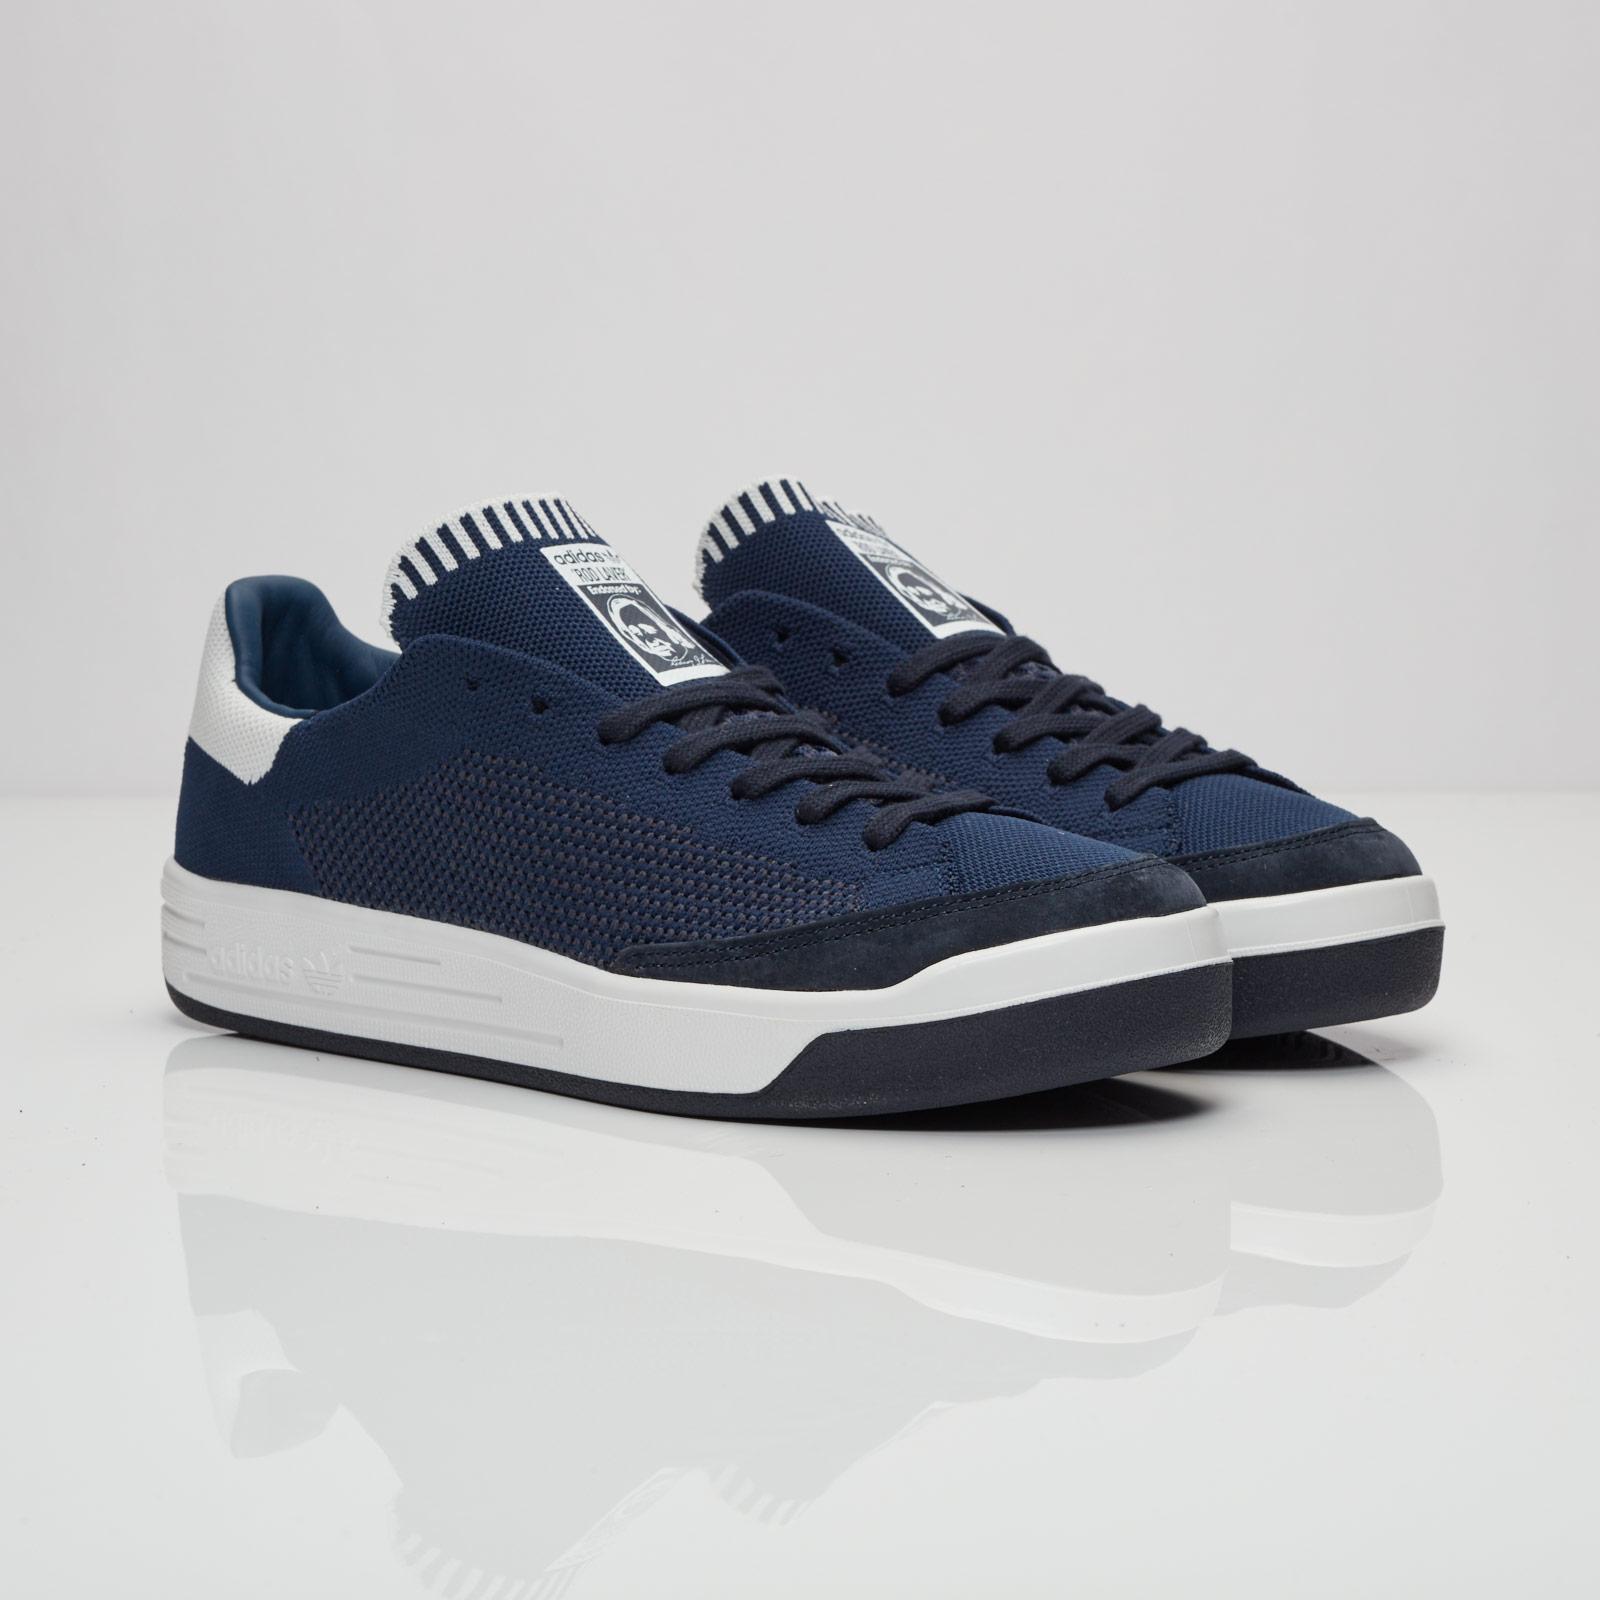 adidas Rod Laver Super Primeknit - S80513 - Sneakersnstuff ... 2be2678ab